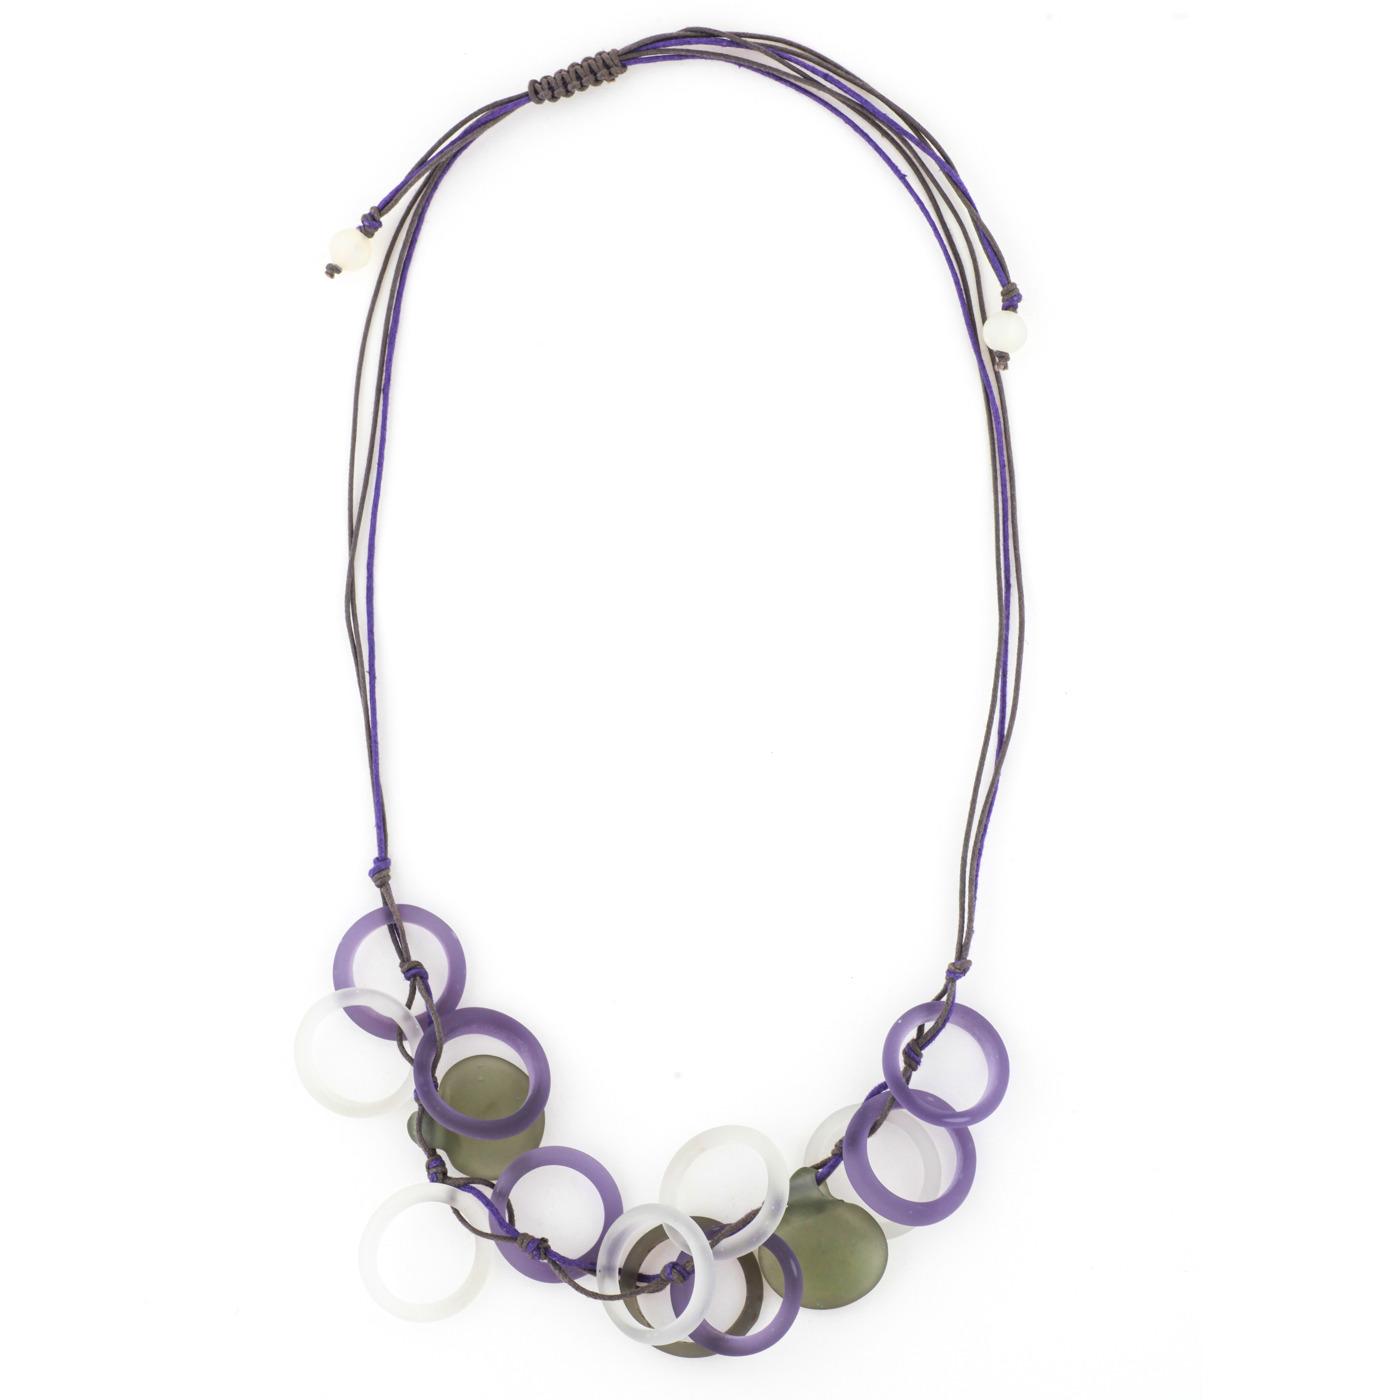 Artisan, Eco-Friendly, Designer Inner Circle Necklace